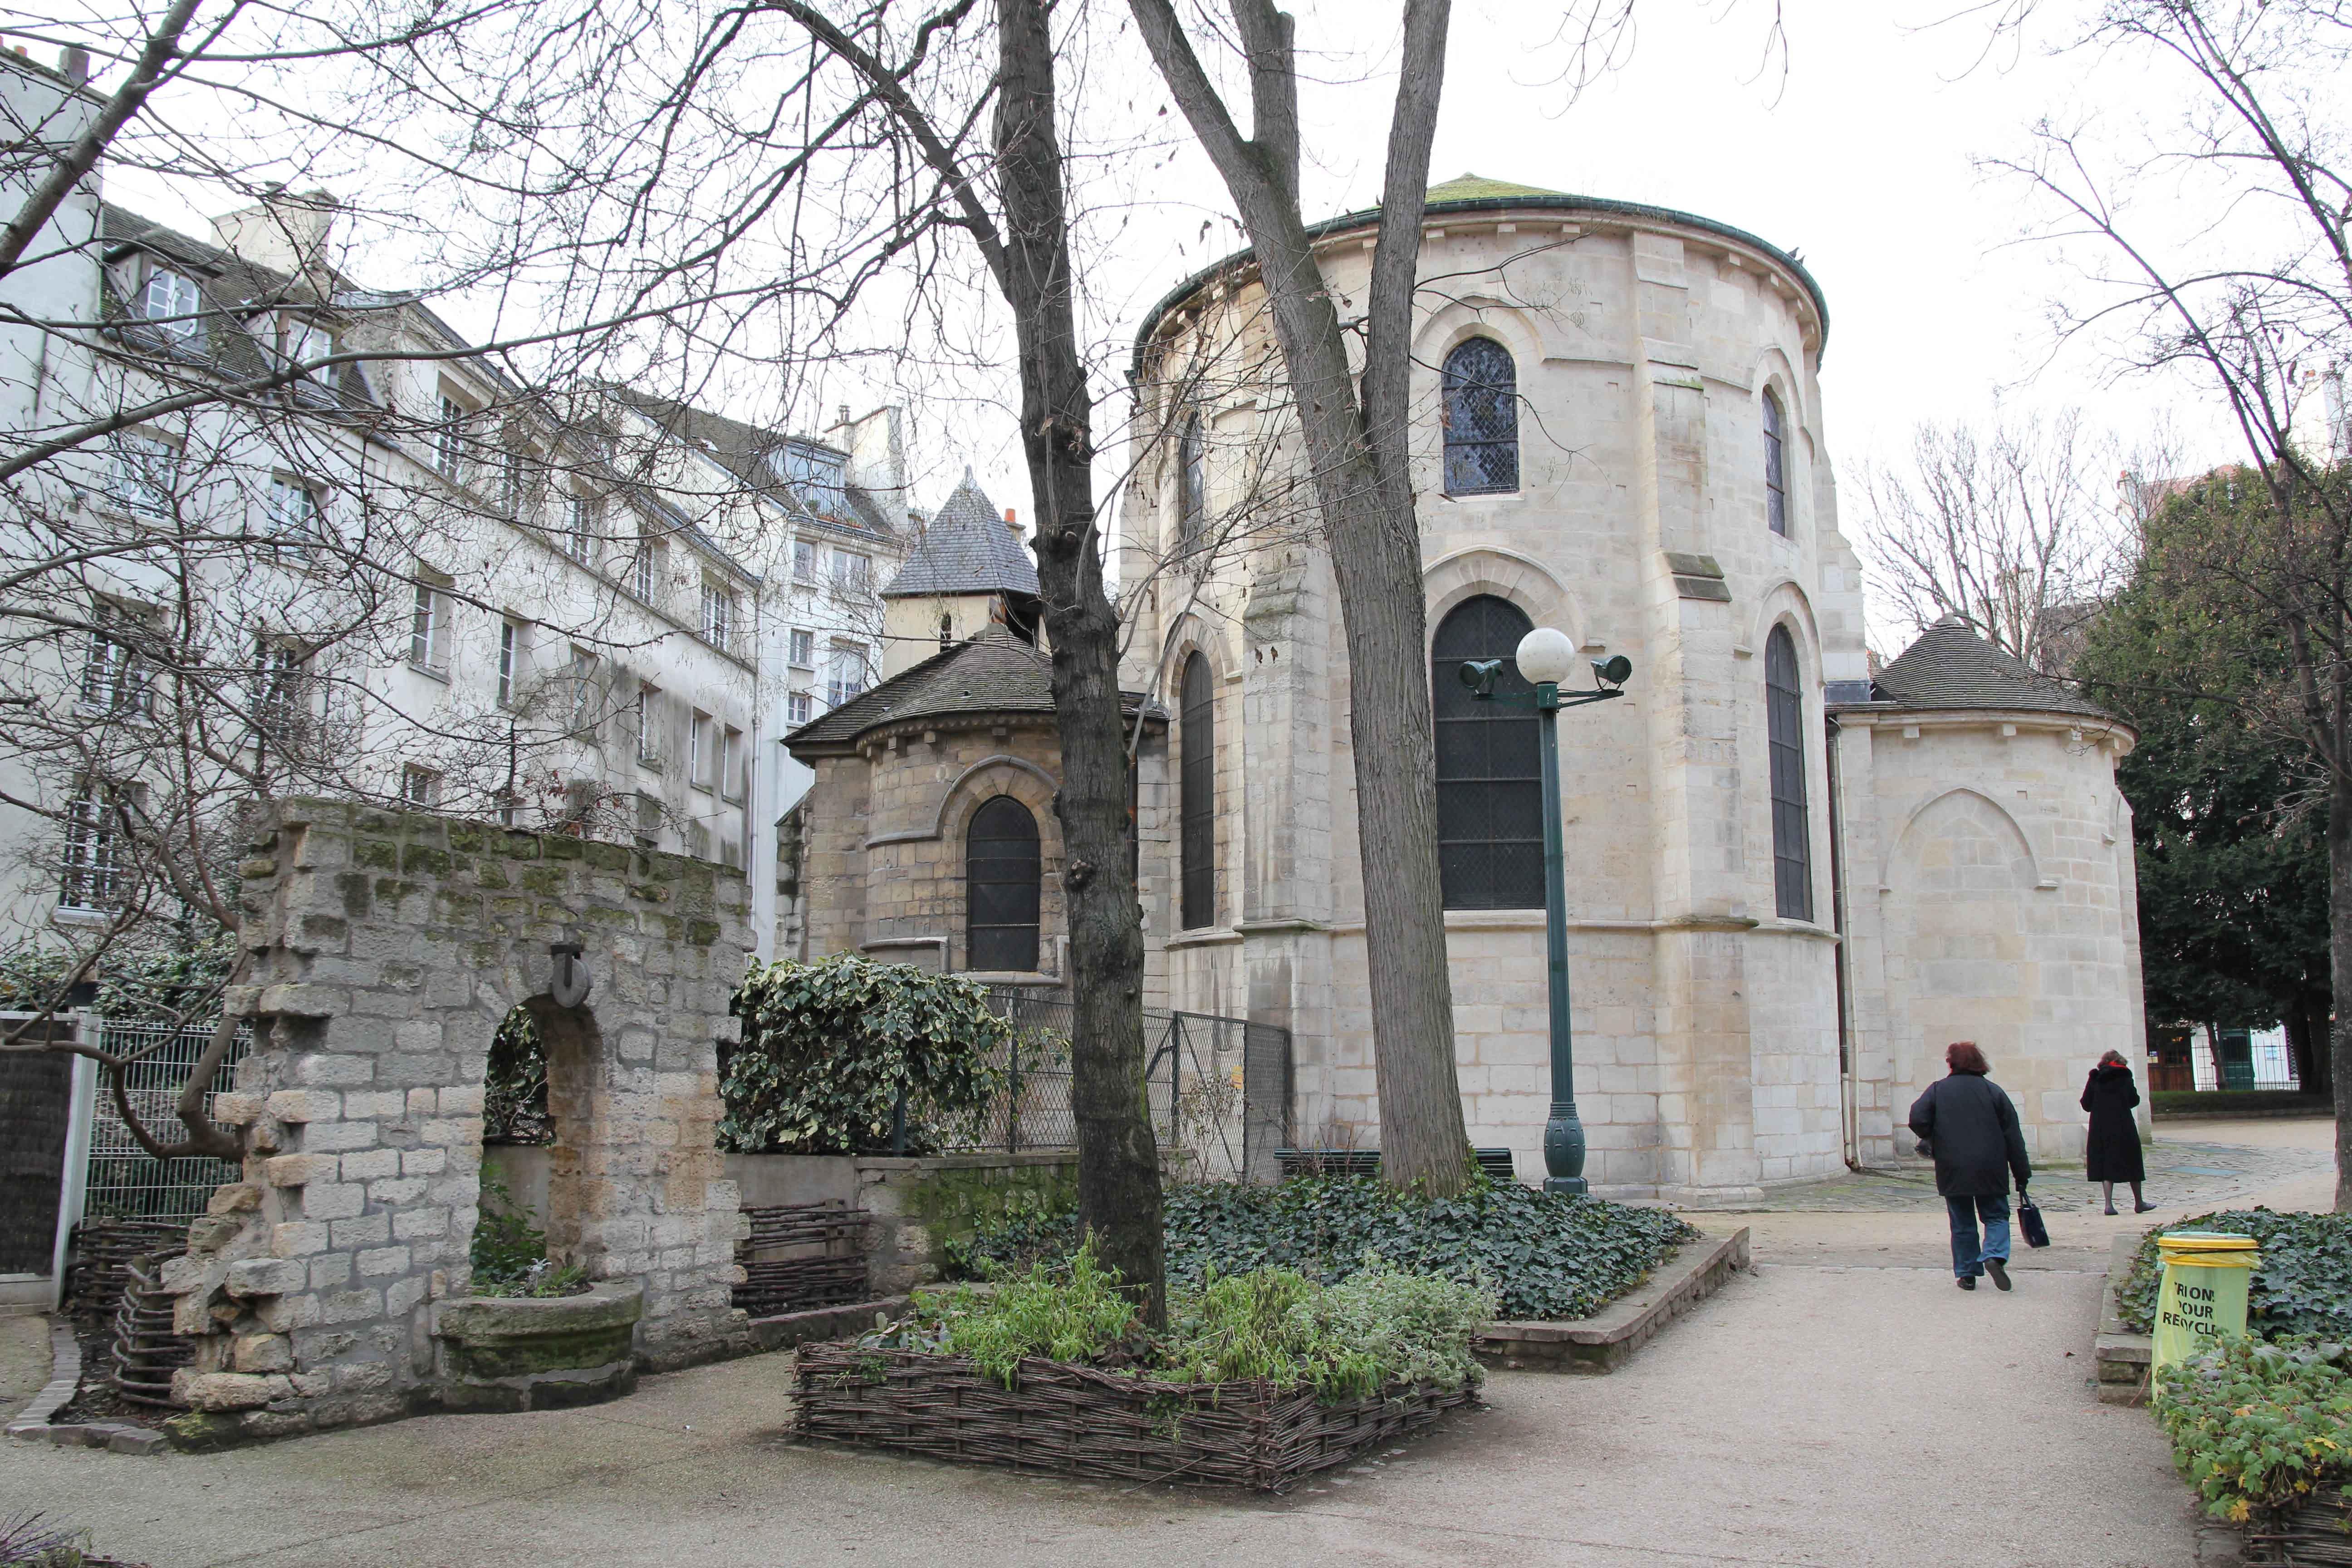 Saint-Julien-le-Pauvre by Archway Andres